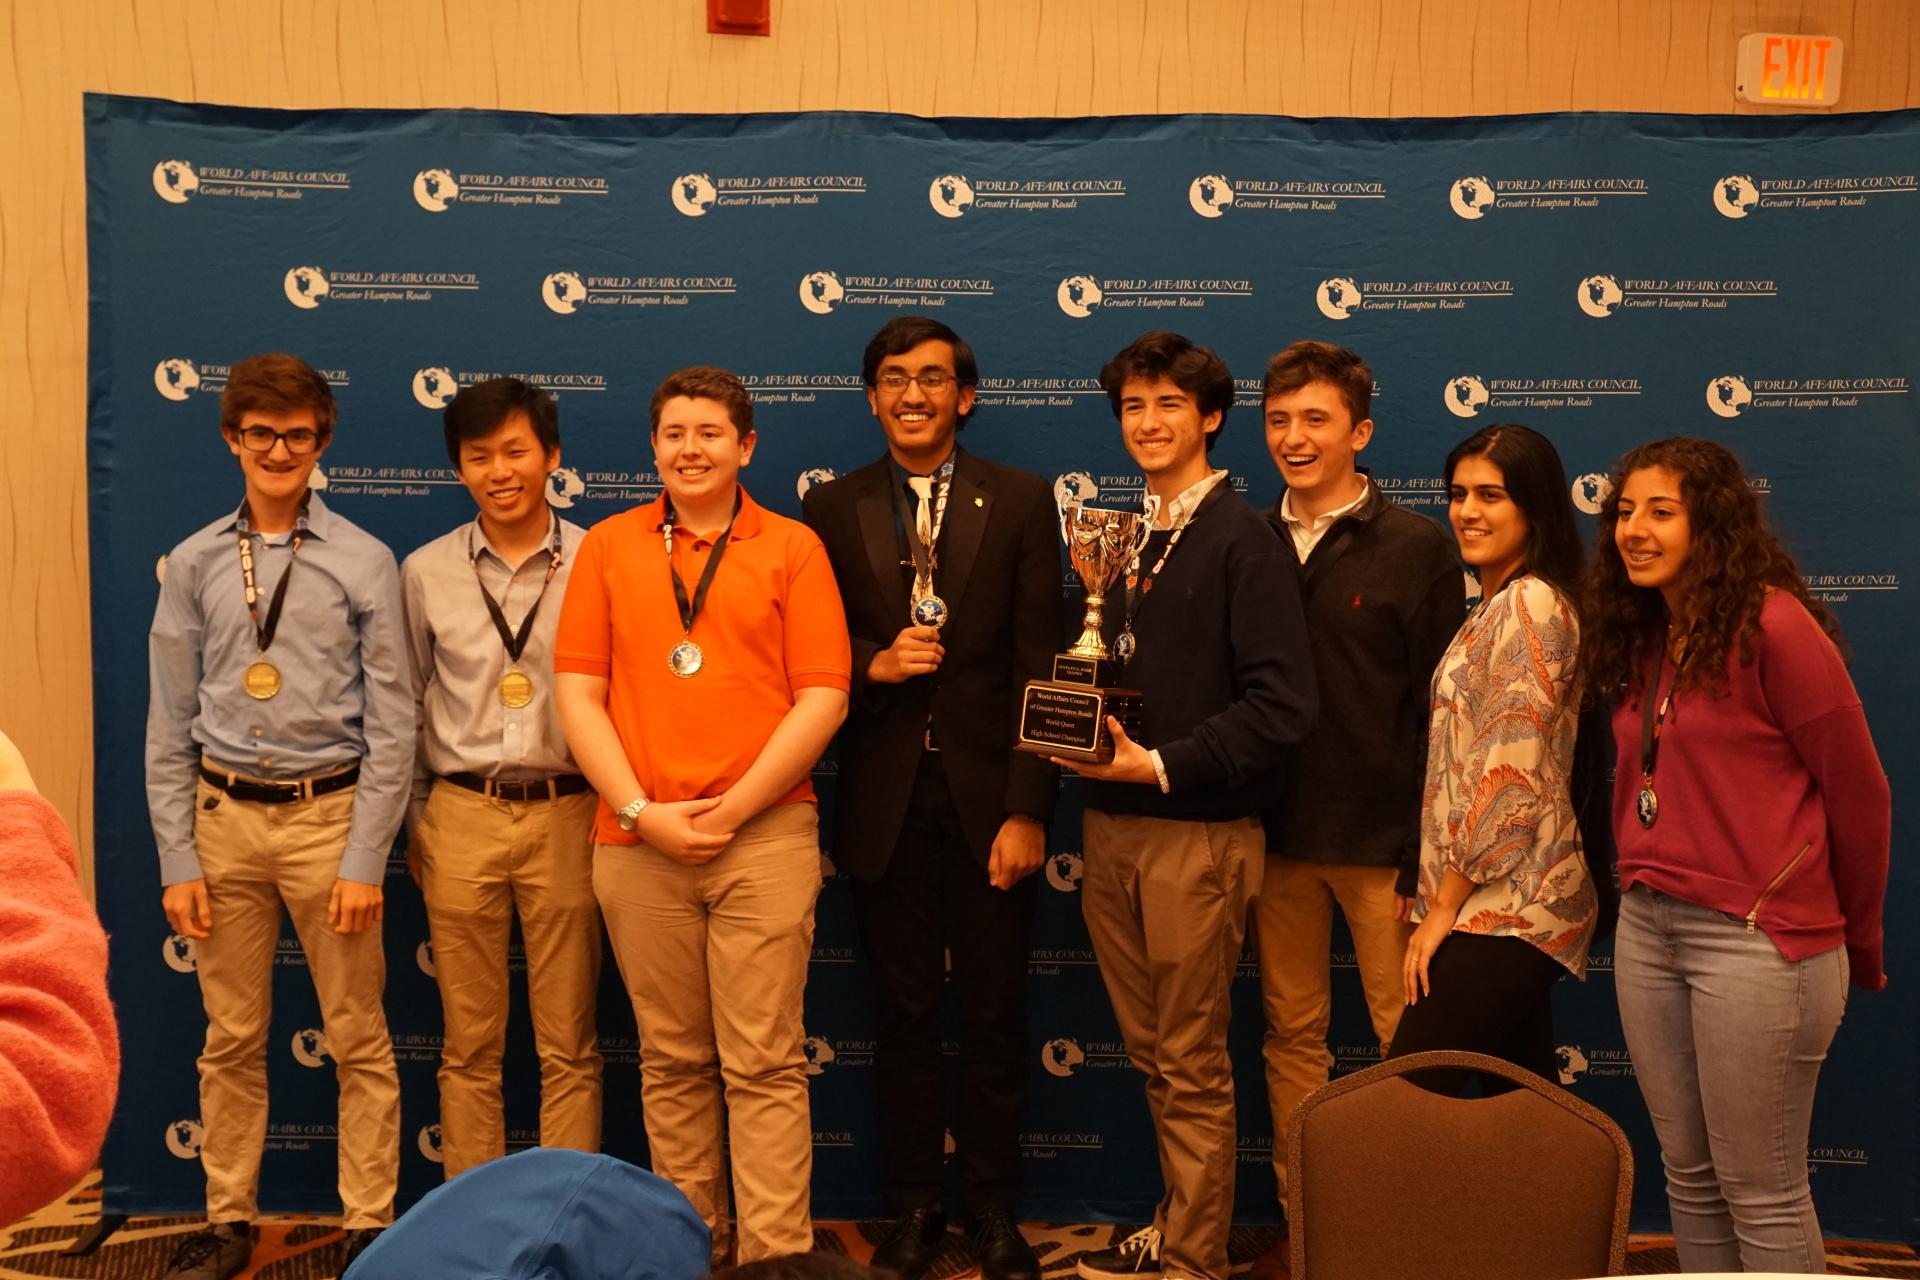 High School Team Winners: Princess Anne High School